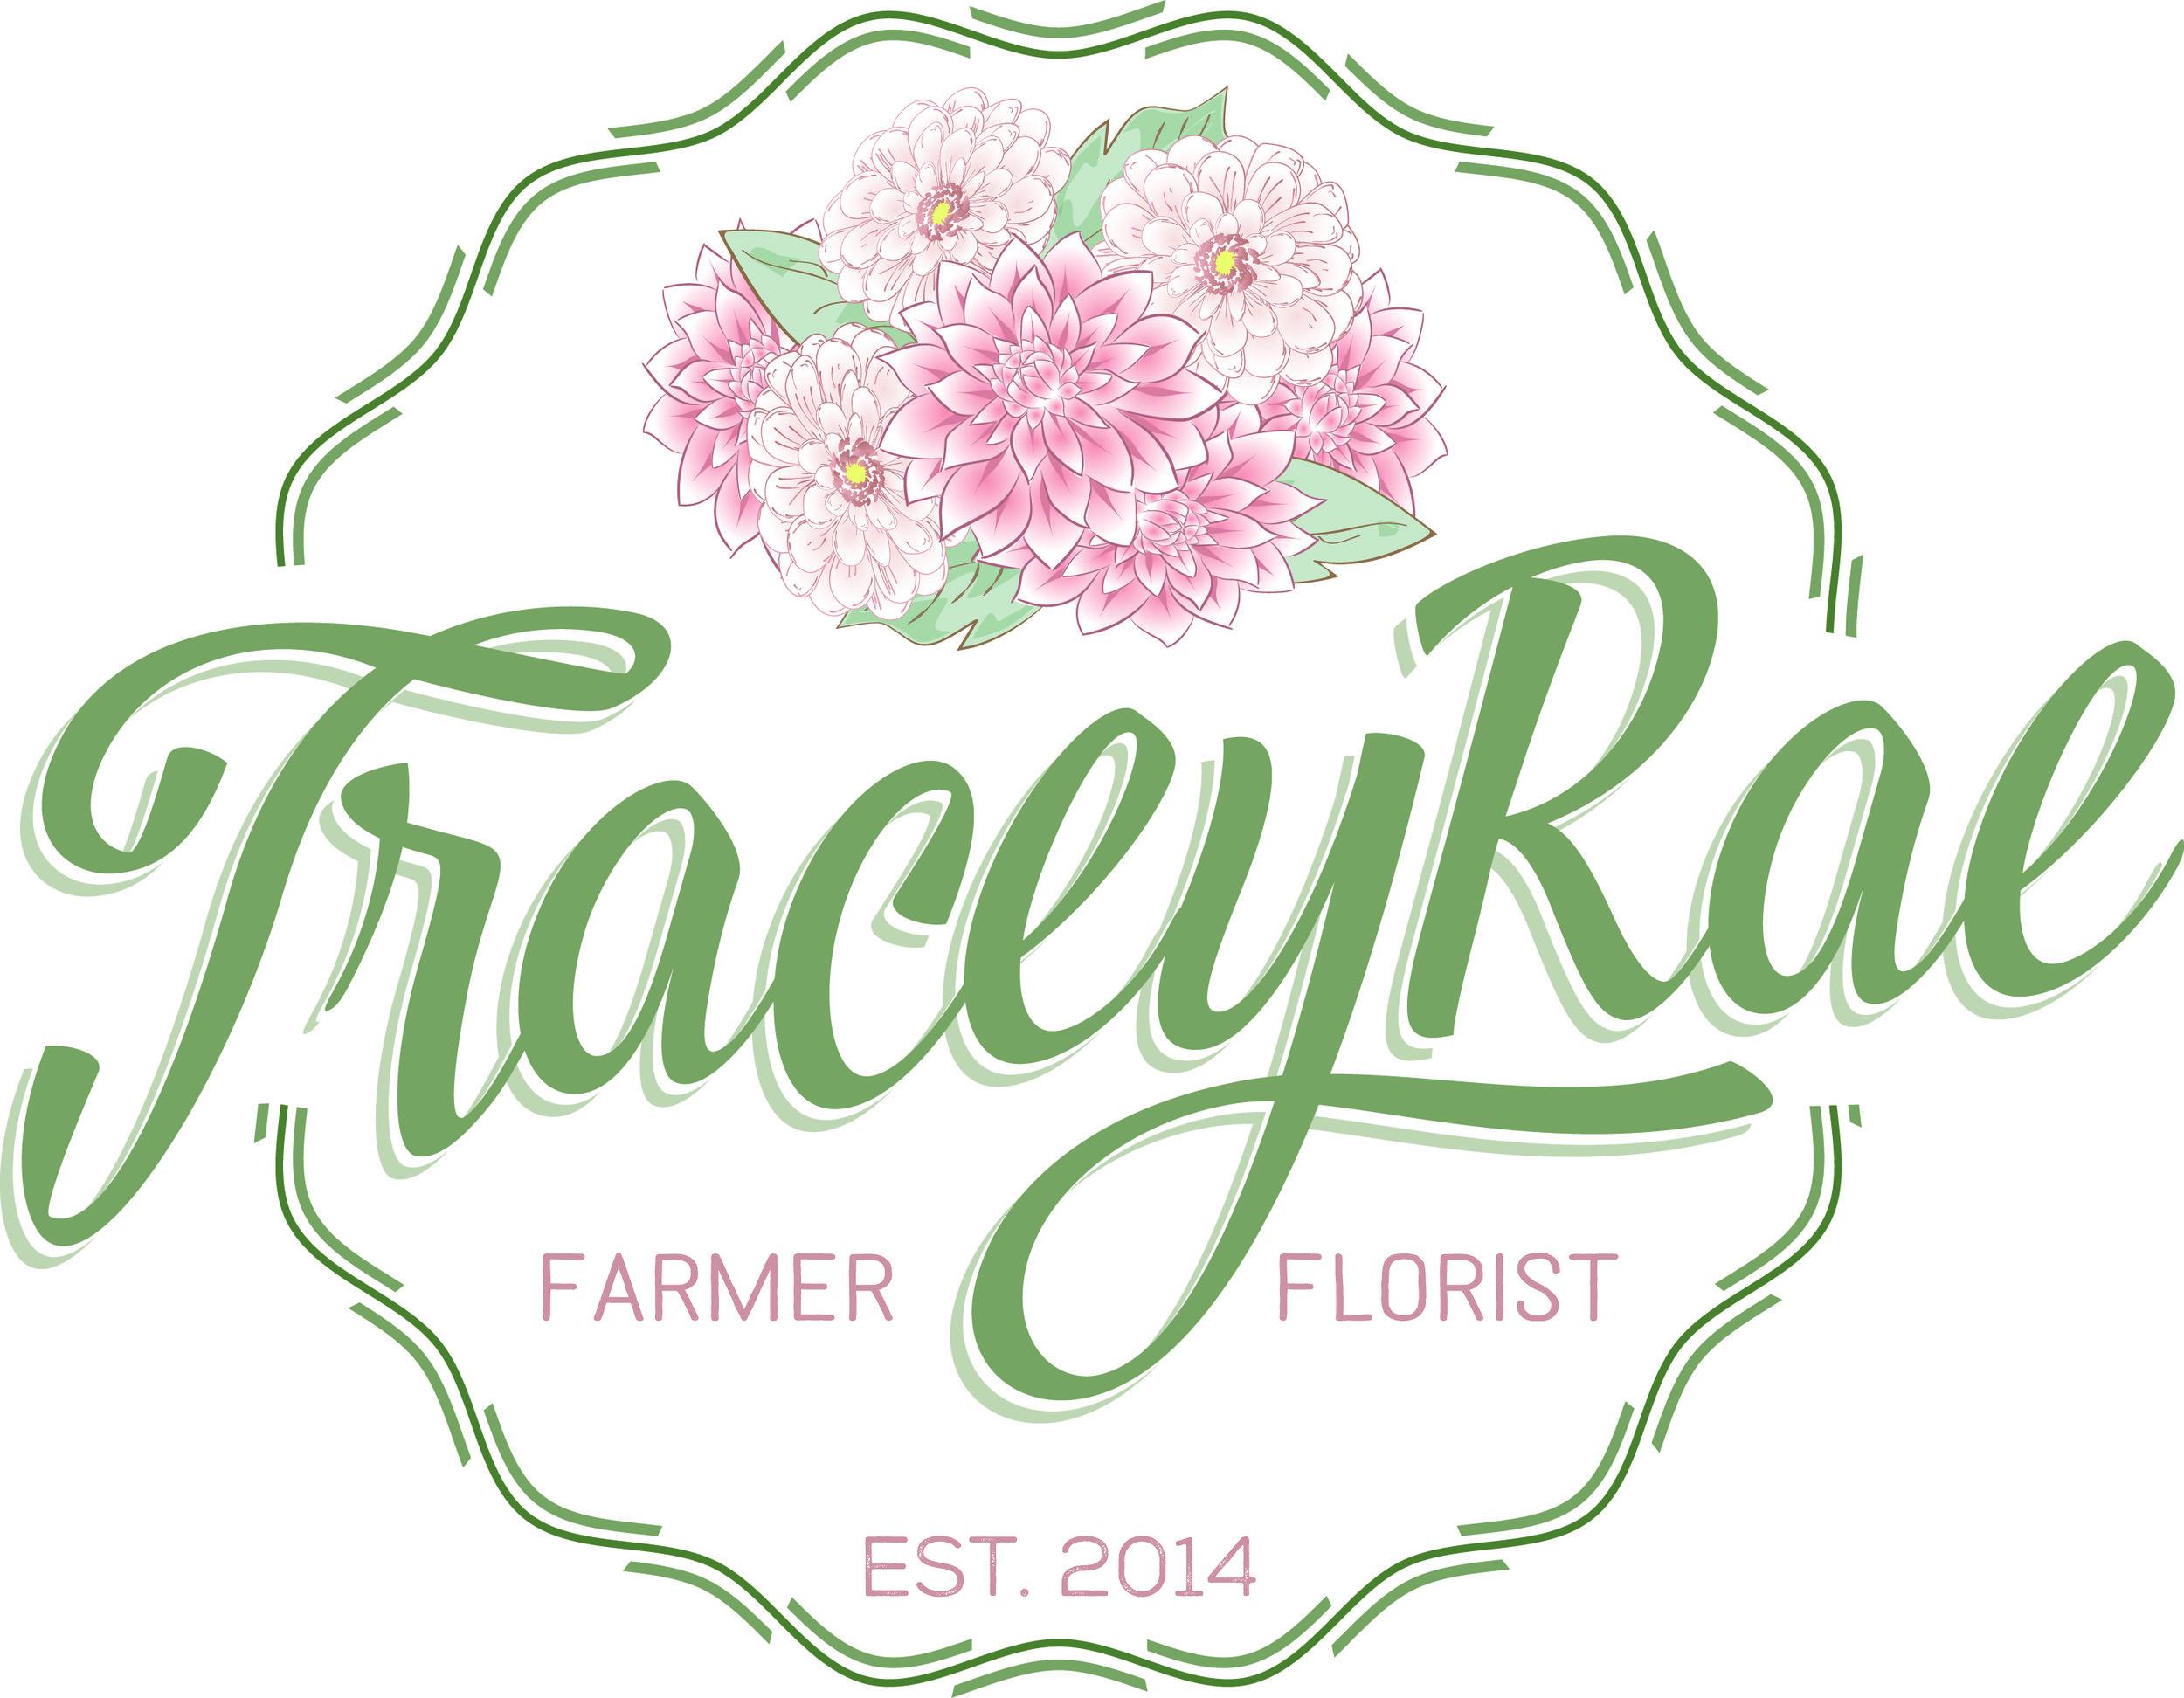 tracey_rae_logo.jpg